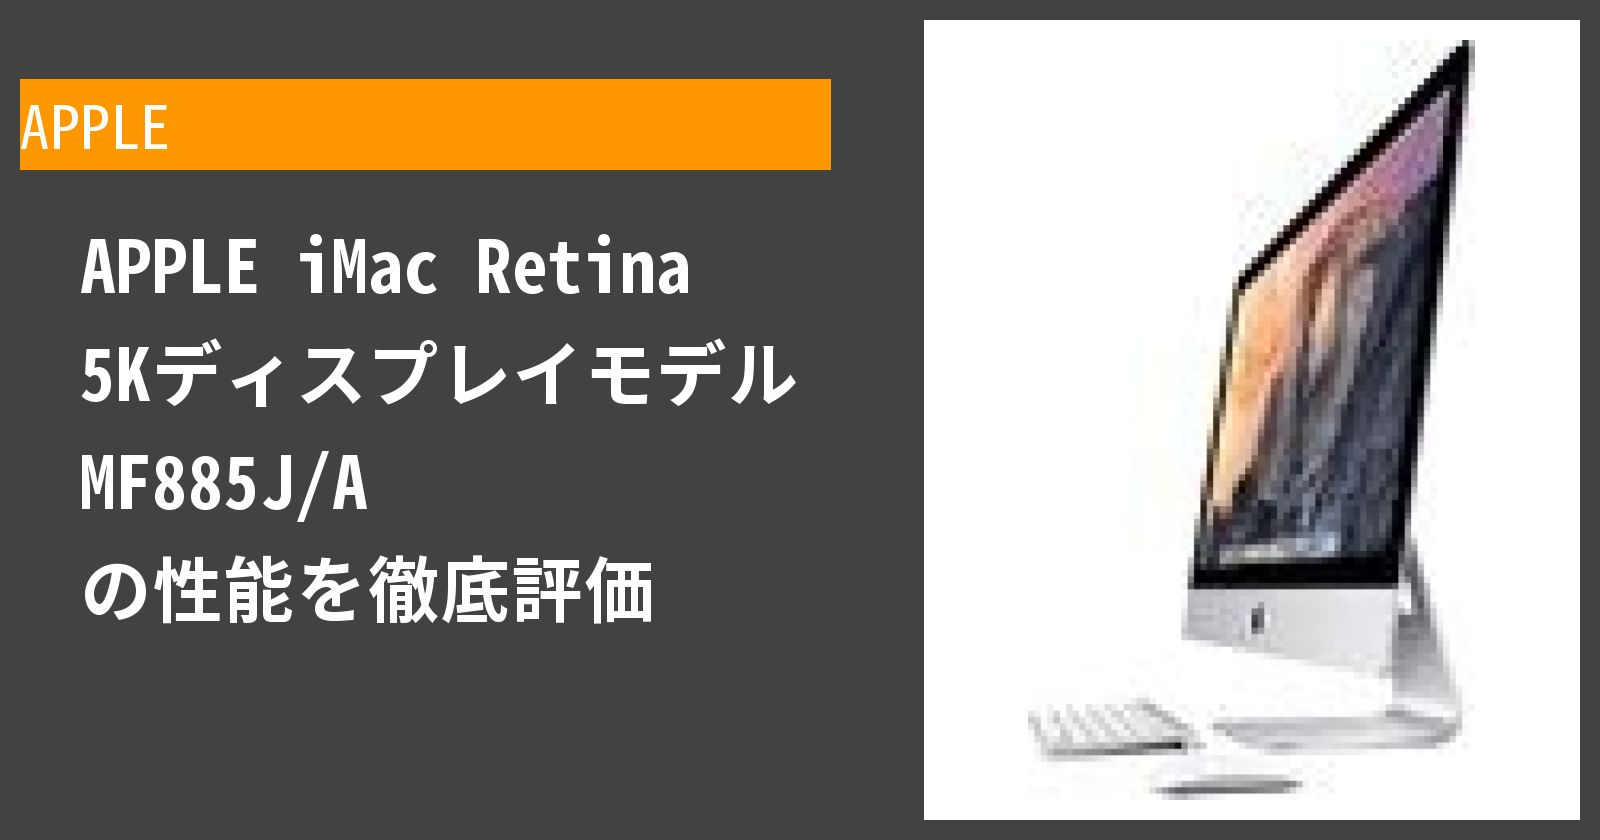 iMac Retina 5K(MF885J/A) の性能を徹底評価